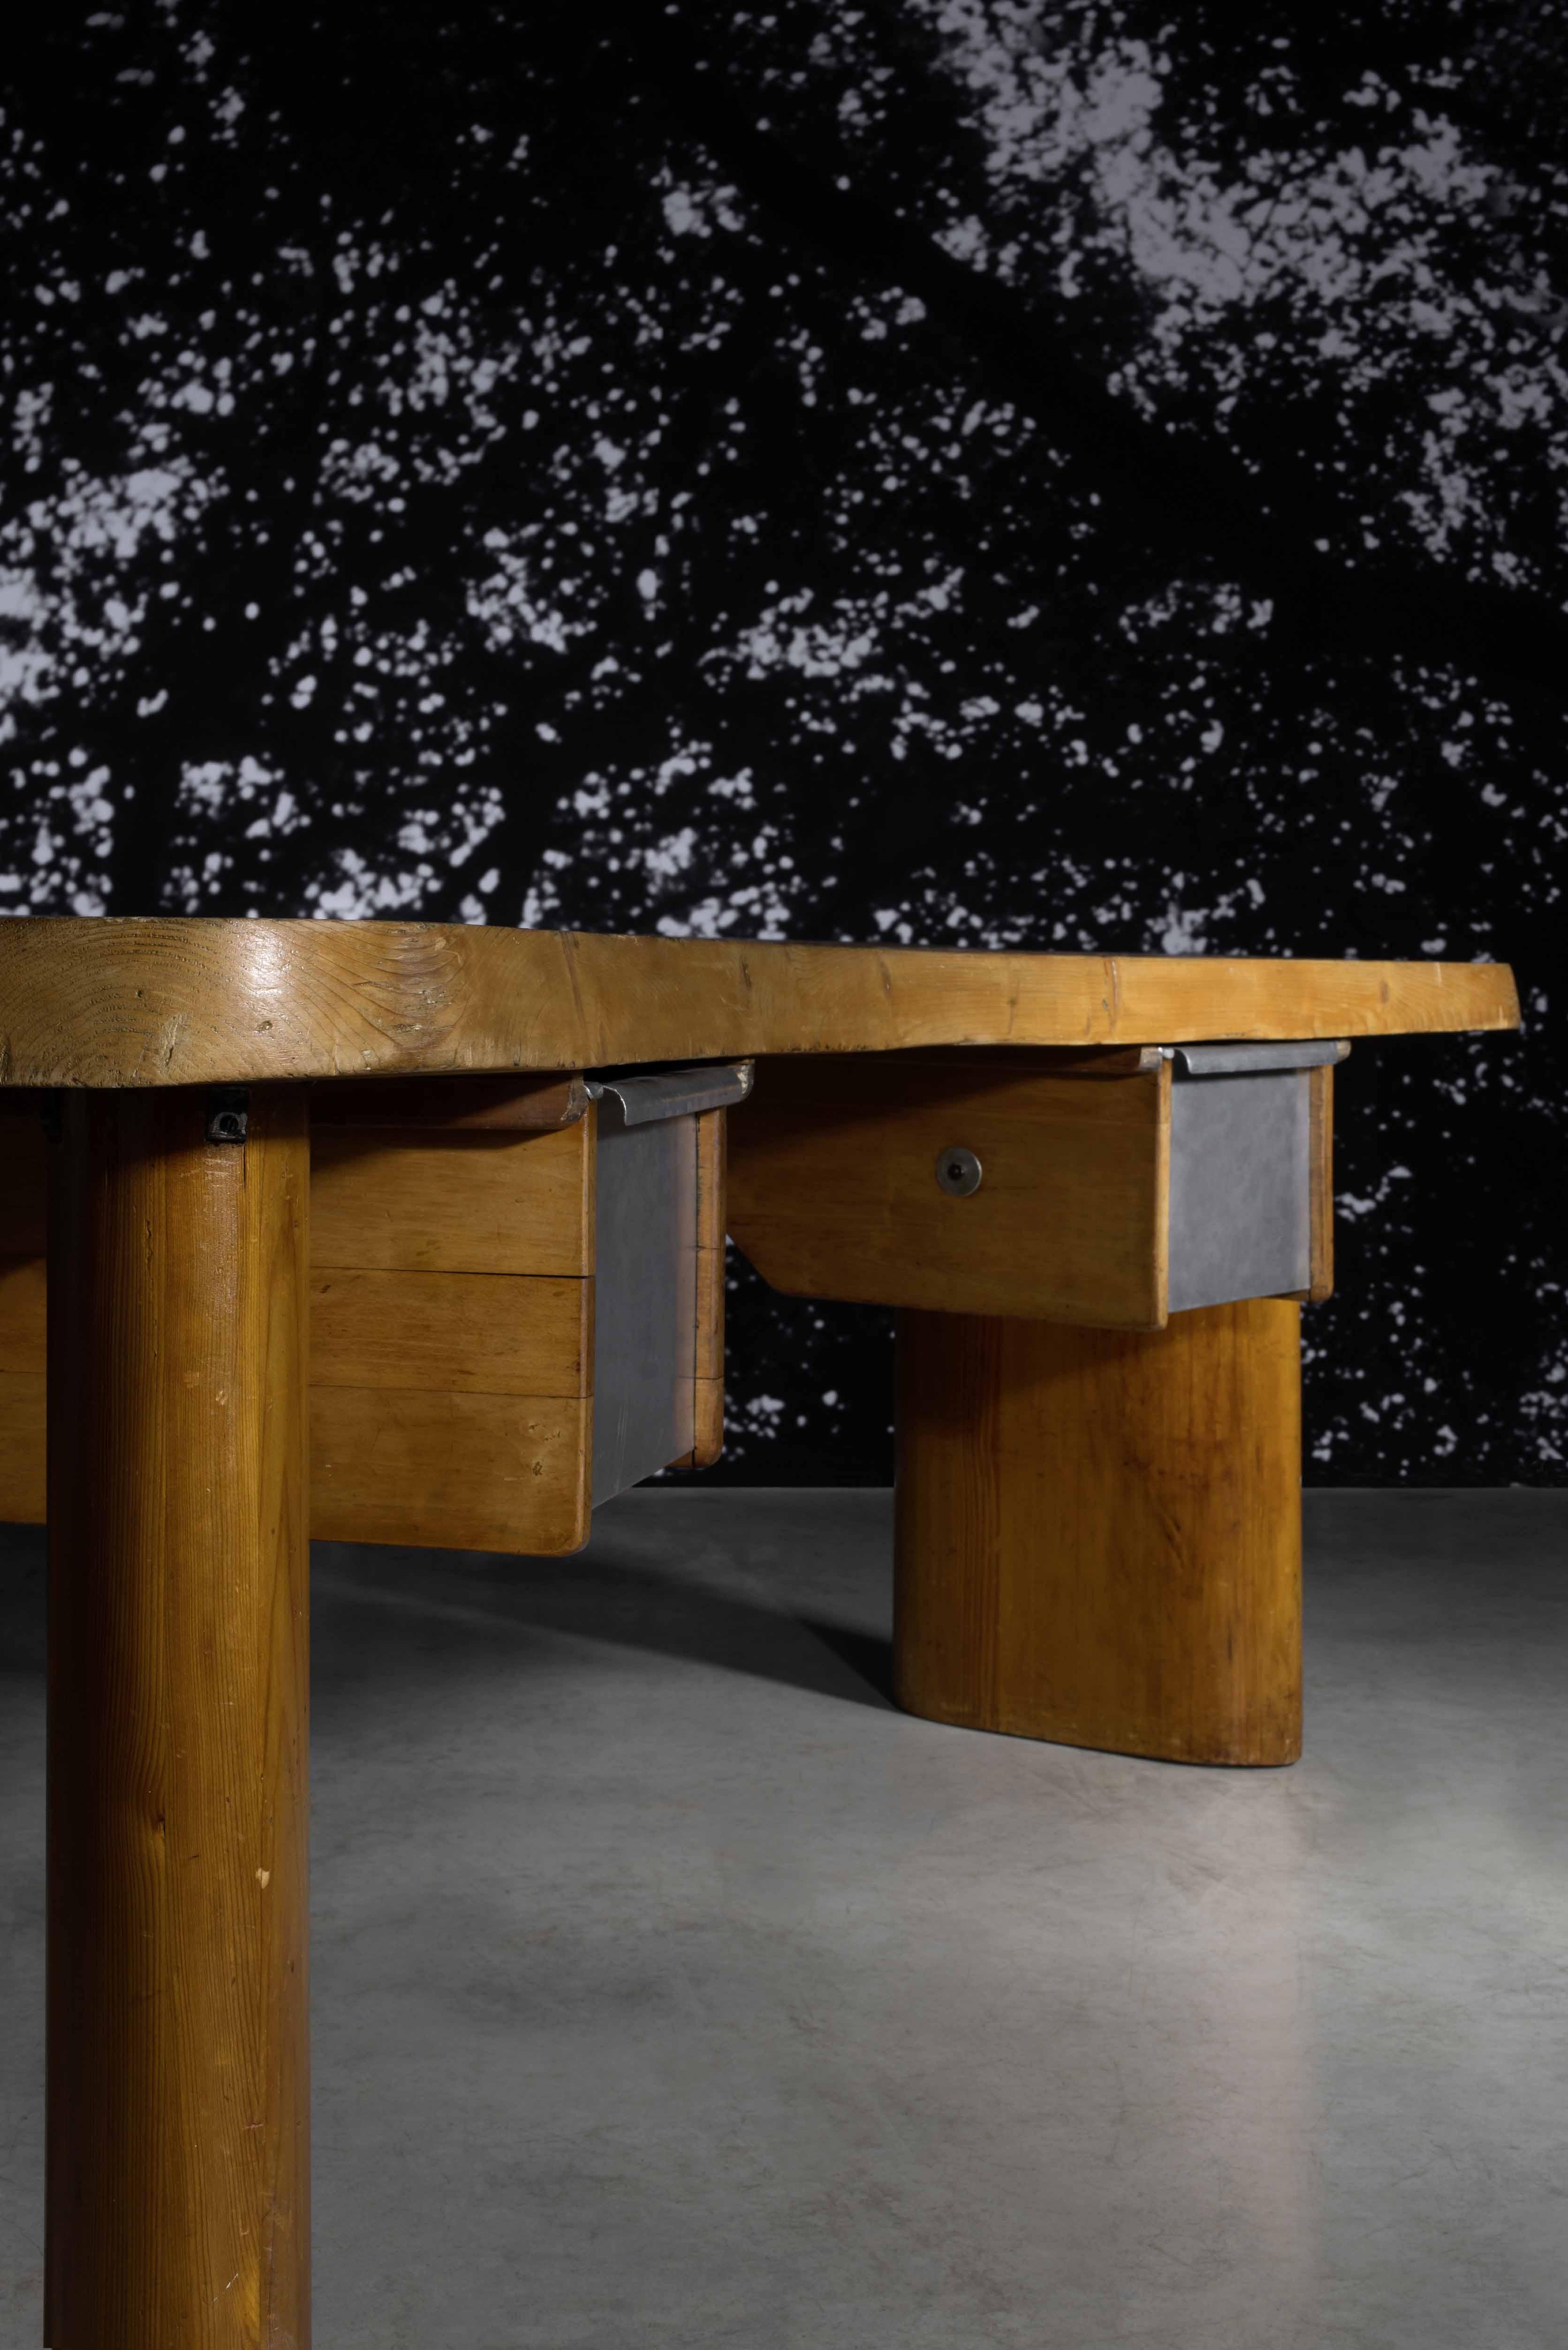 Lot 11 Charlotte Perriand, important bureau dit « en forme », 1943-1944 - © Artcurial